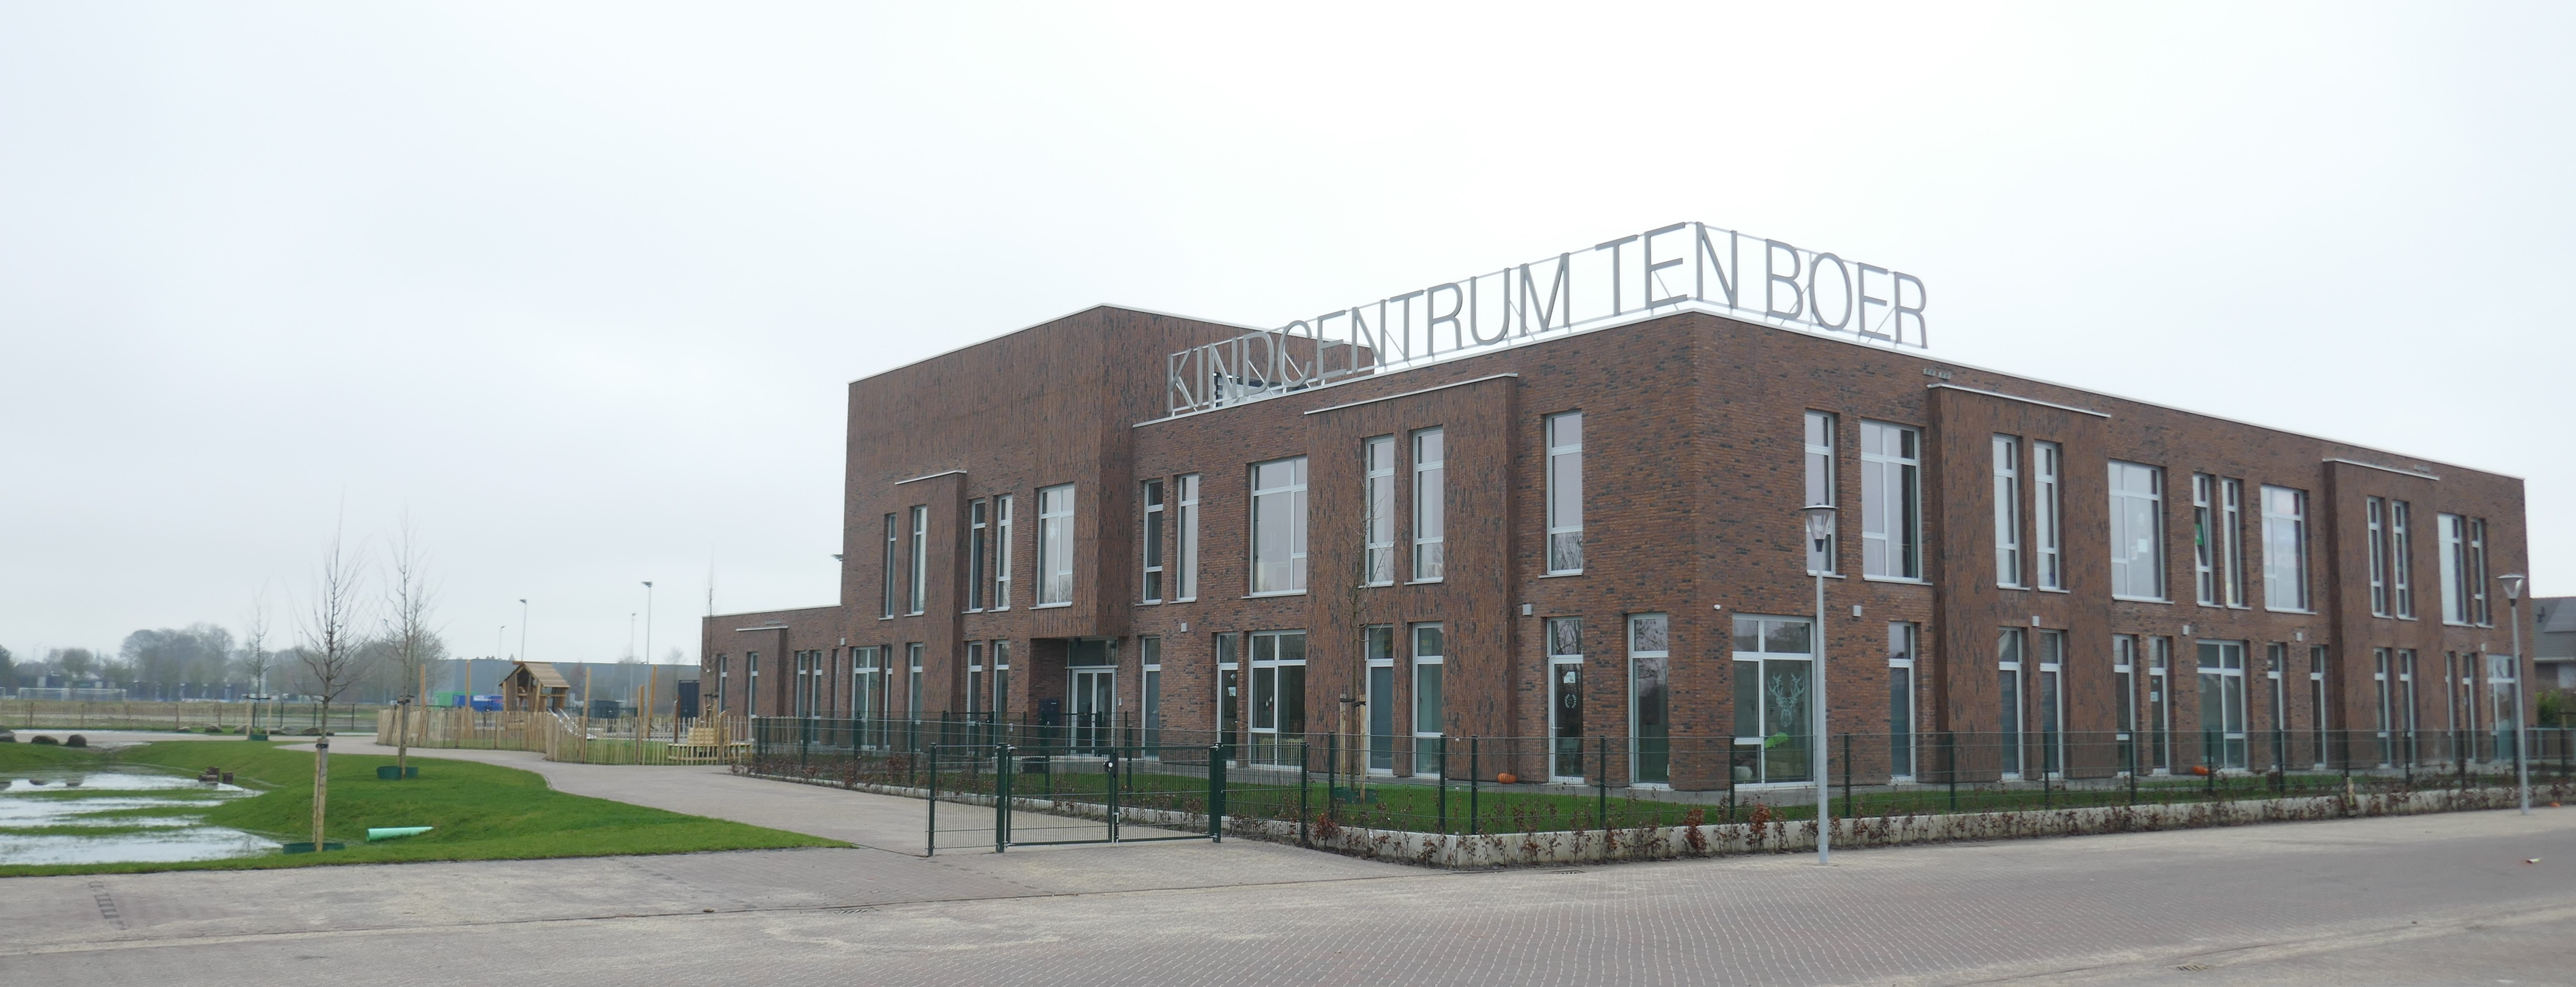 Kindcentrum Ten Boer